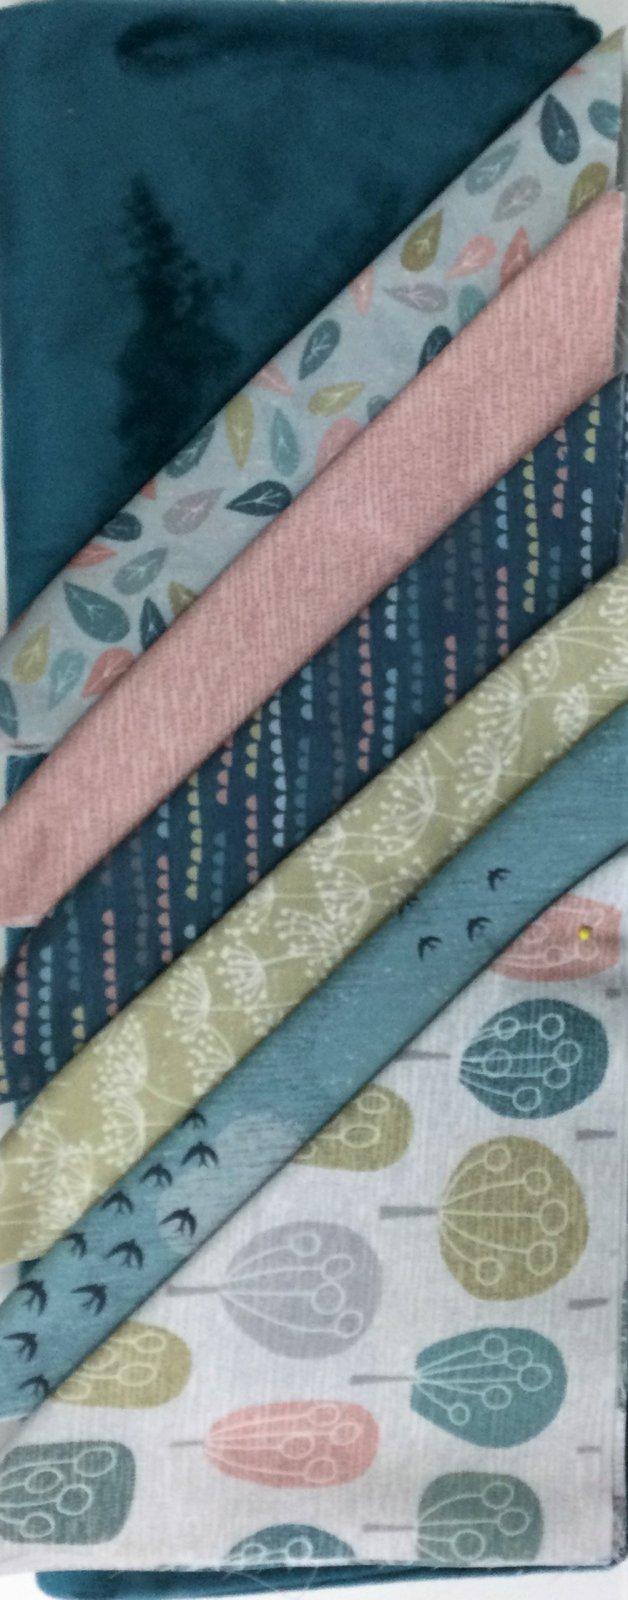 Adult Minky Quilt Kit - Elements & Breeze - Dark Teal Minky